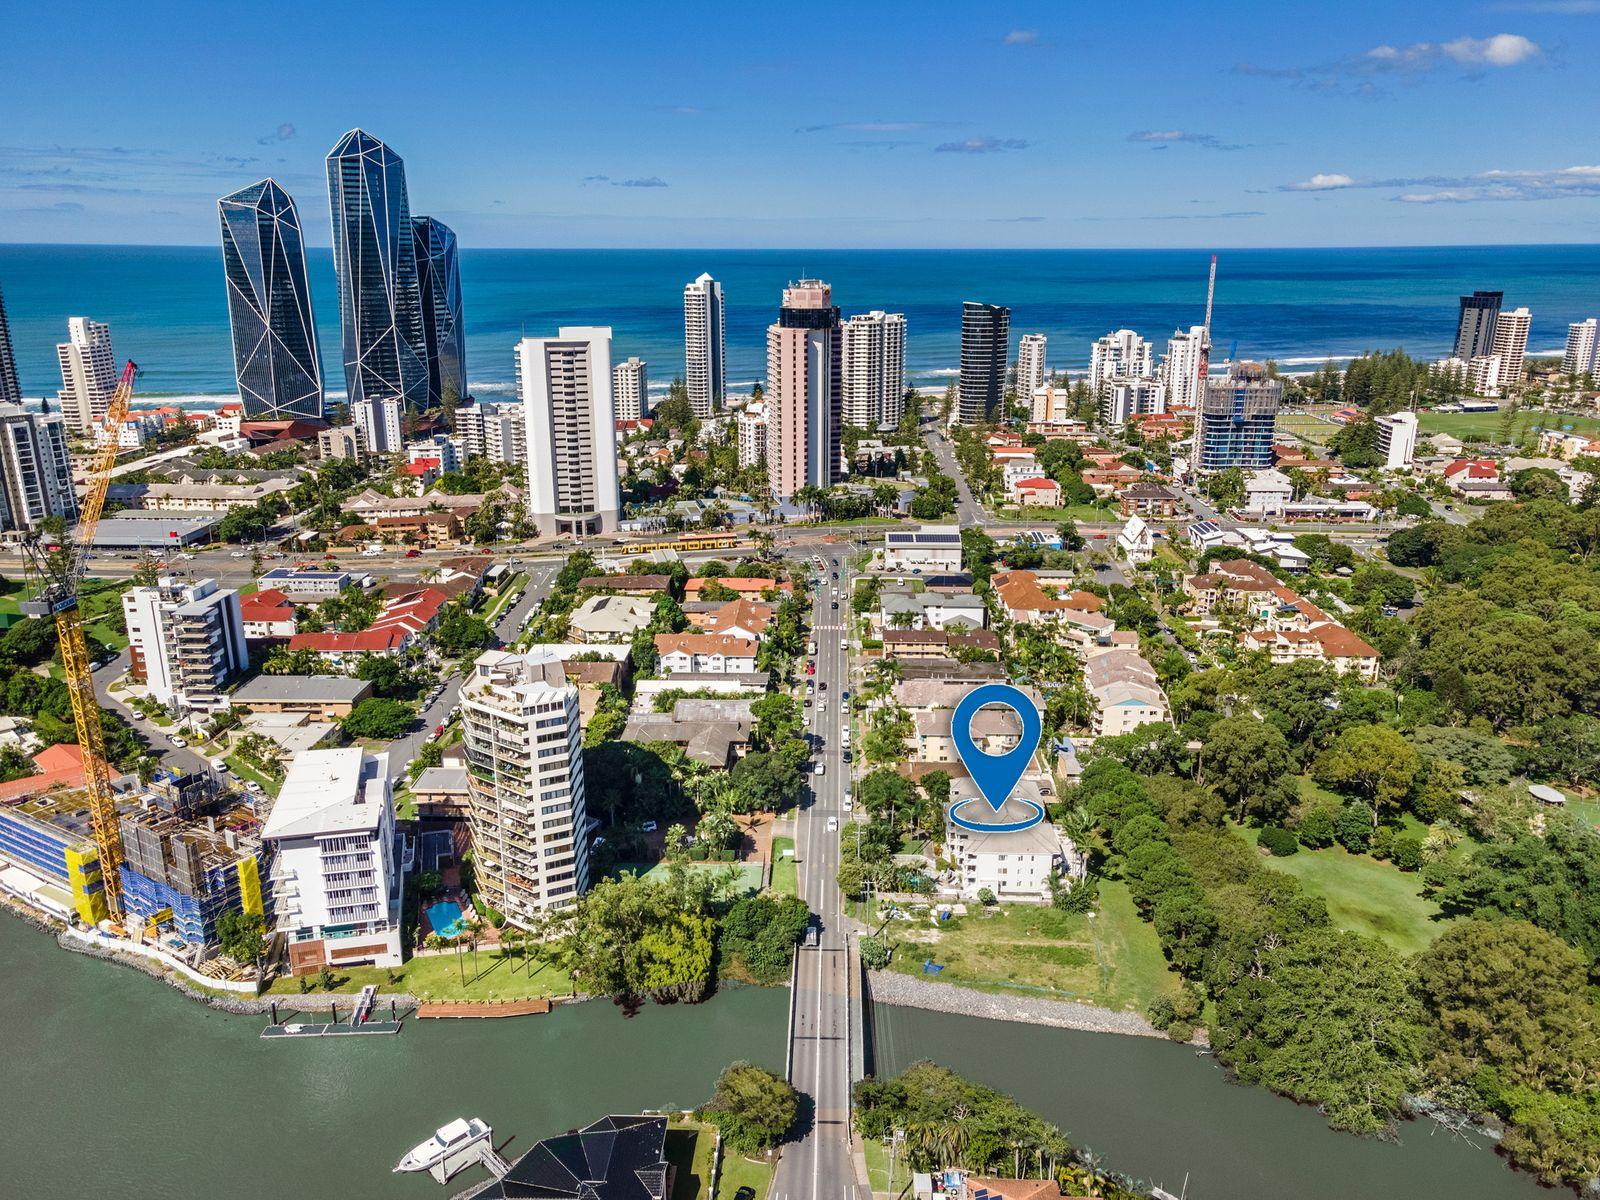 1/36-40 Monaco Street, Surfers Paradise, QLD 4217